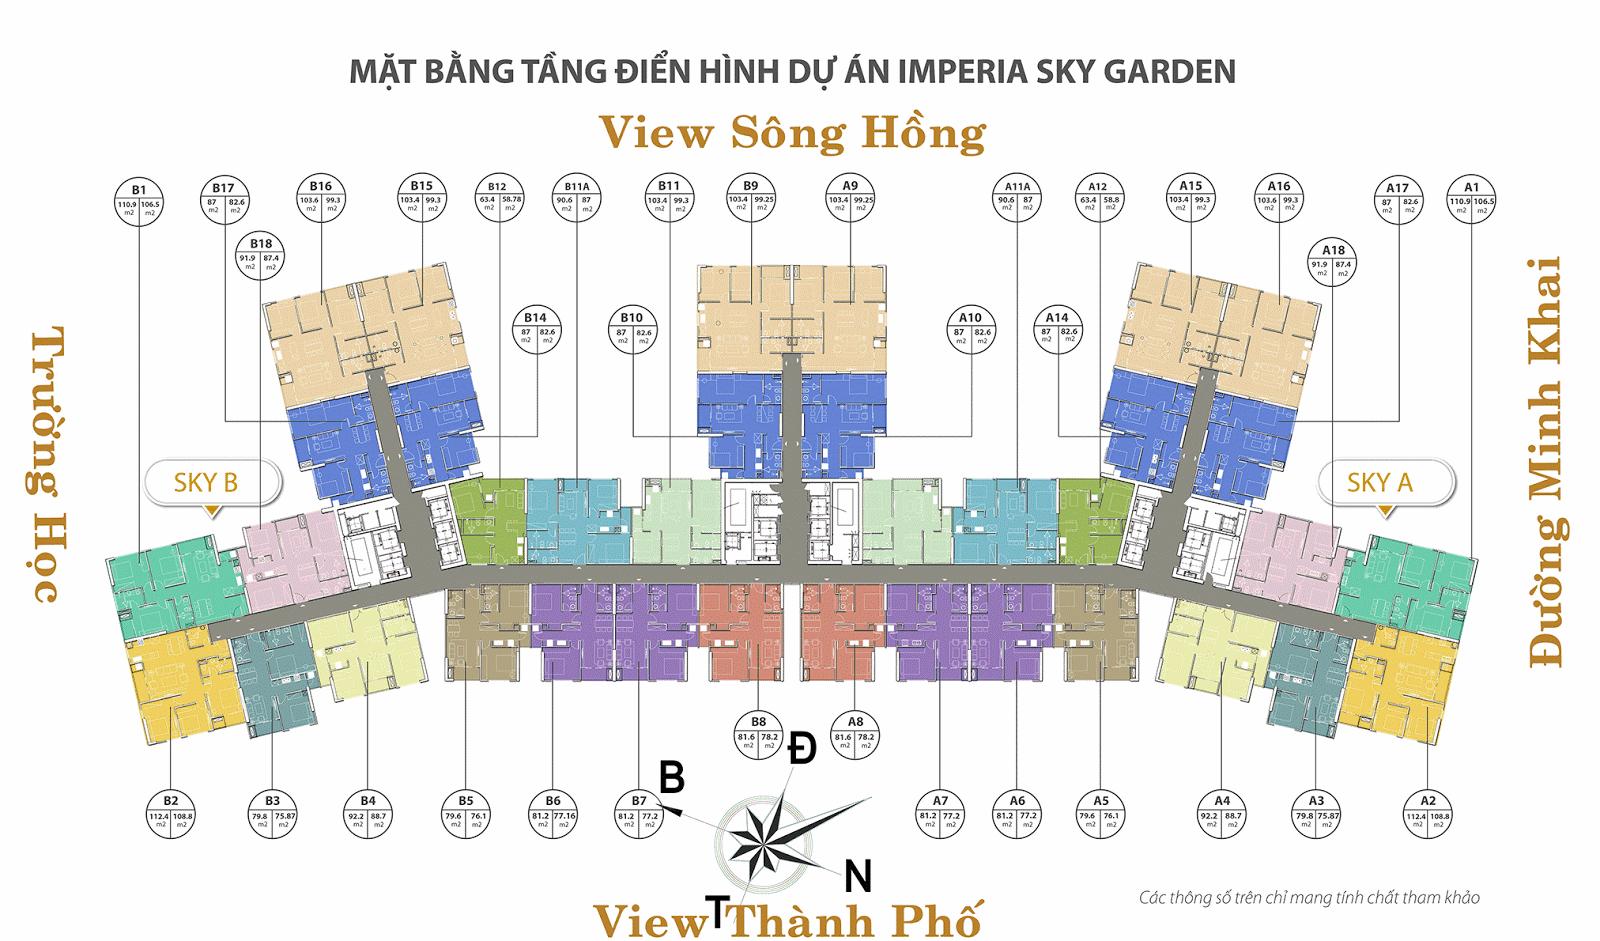 Mặt bằng thiết kế Imperia Sky Garden Minh Khai